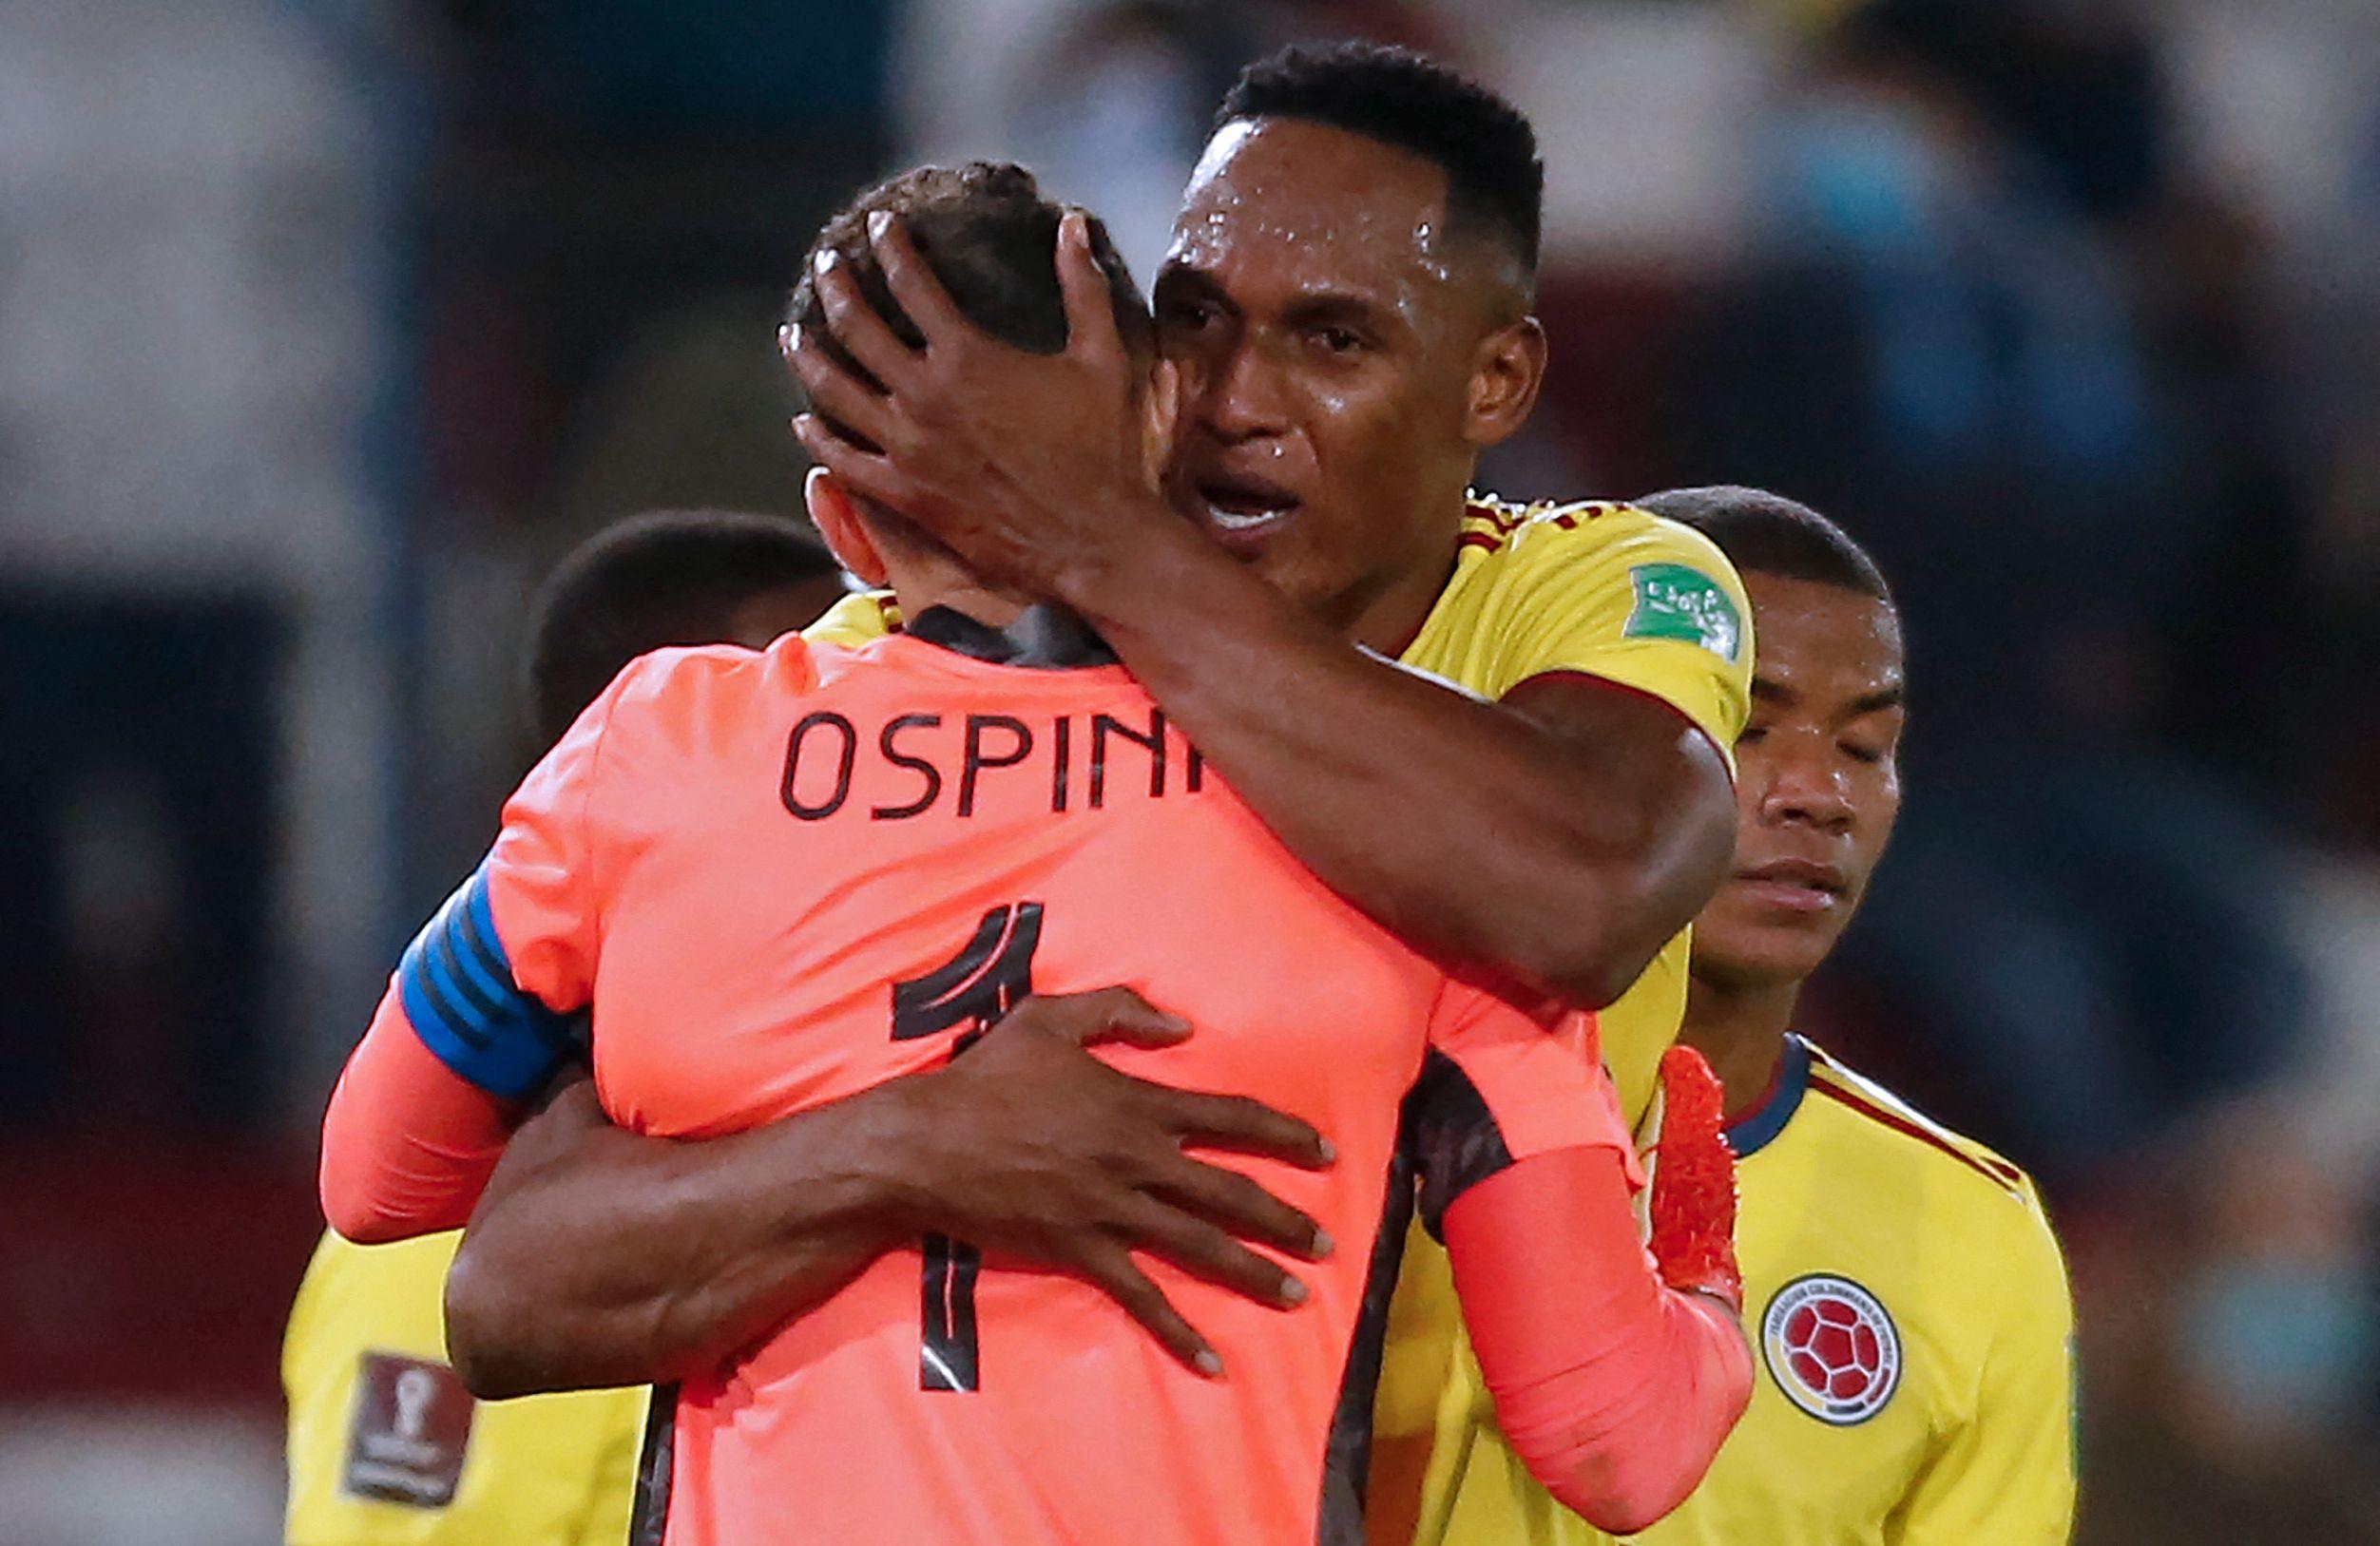 Ospina brilló 0-0 para que Colombia sea la primera en anotar puntos ante Brasil - Prensa Libre